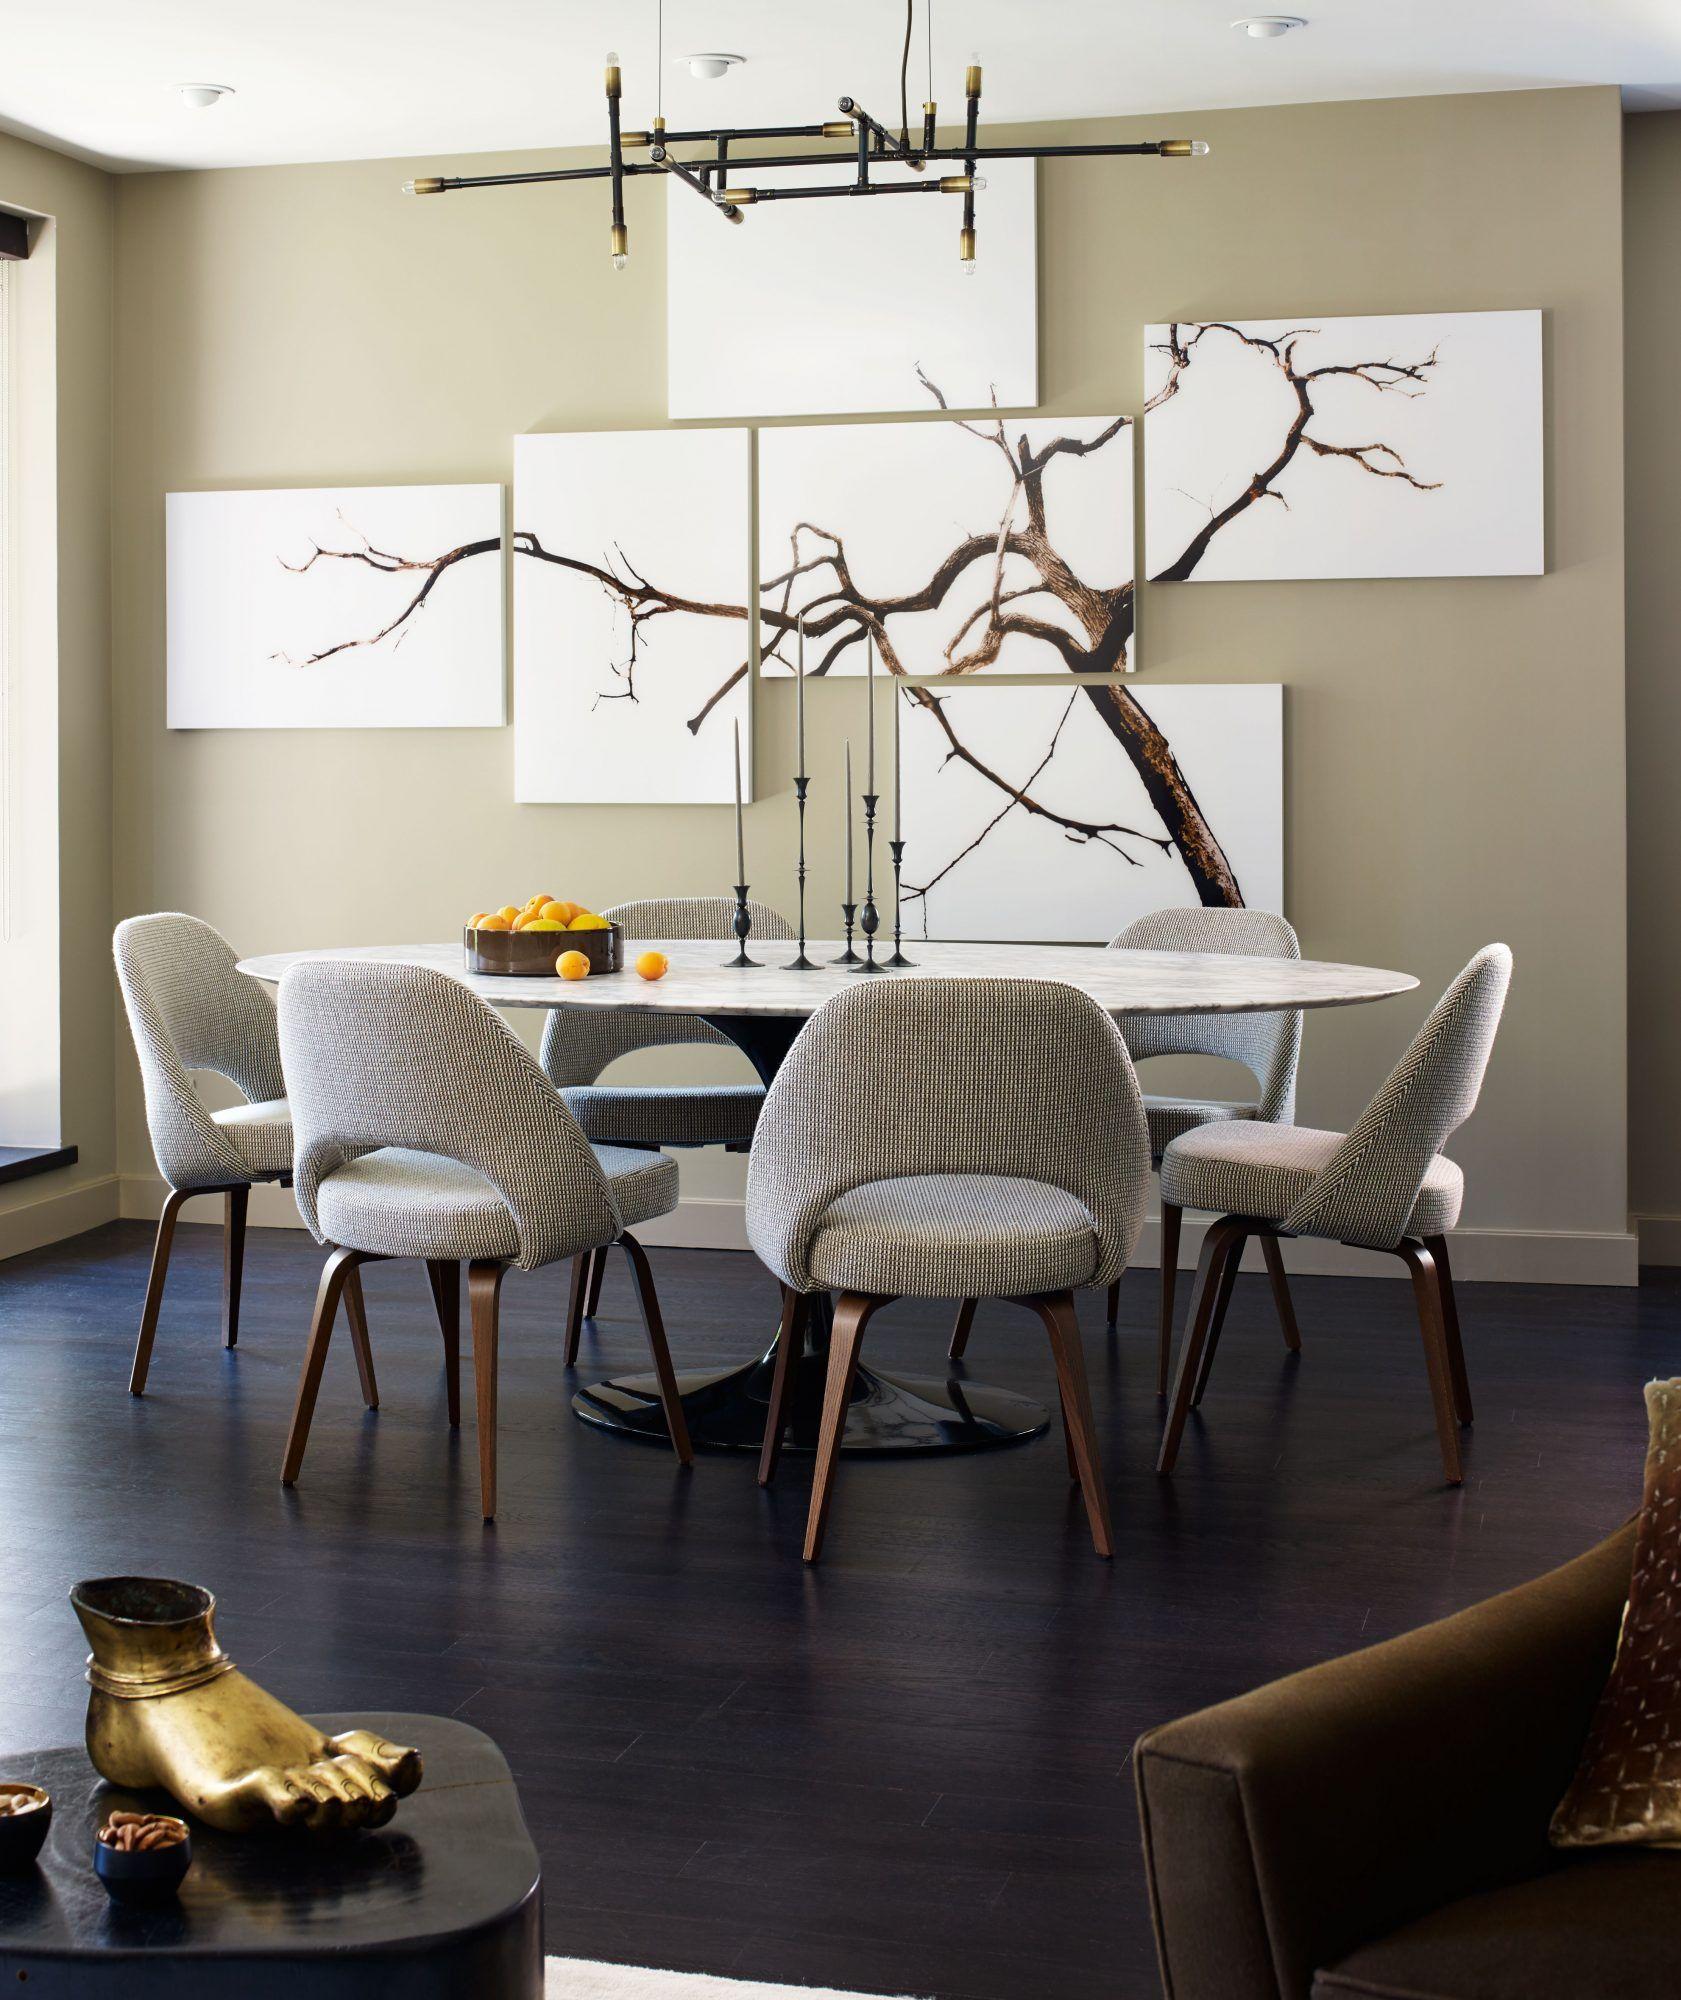 22 Modern Living Room Design Ideas In 2020 Small Room De